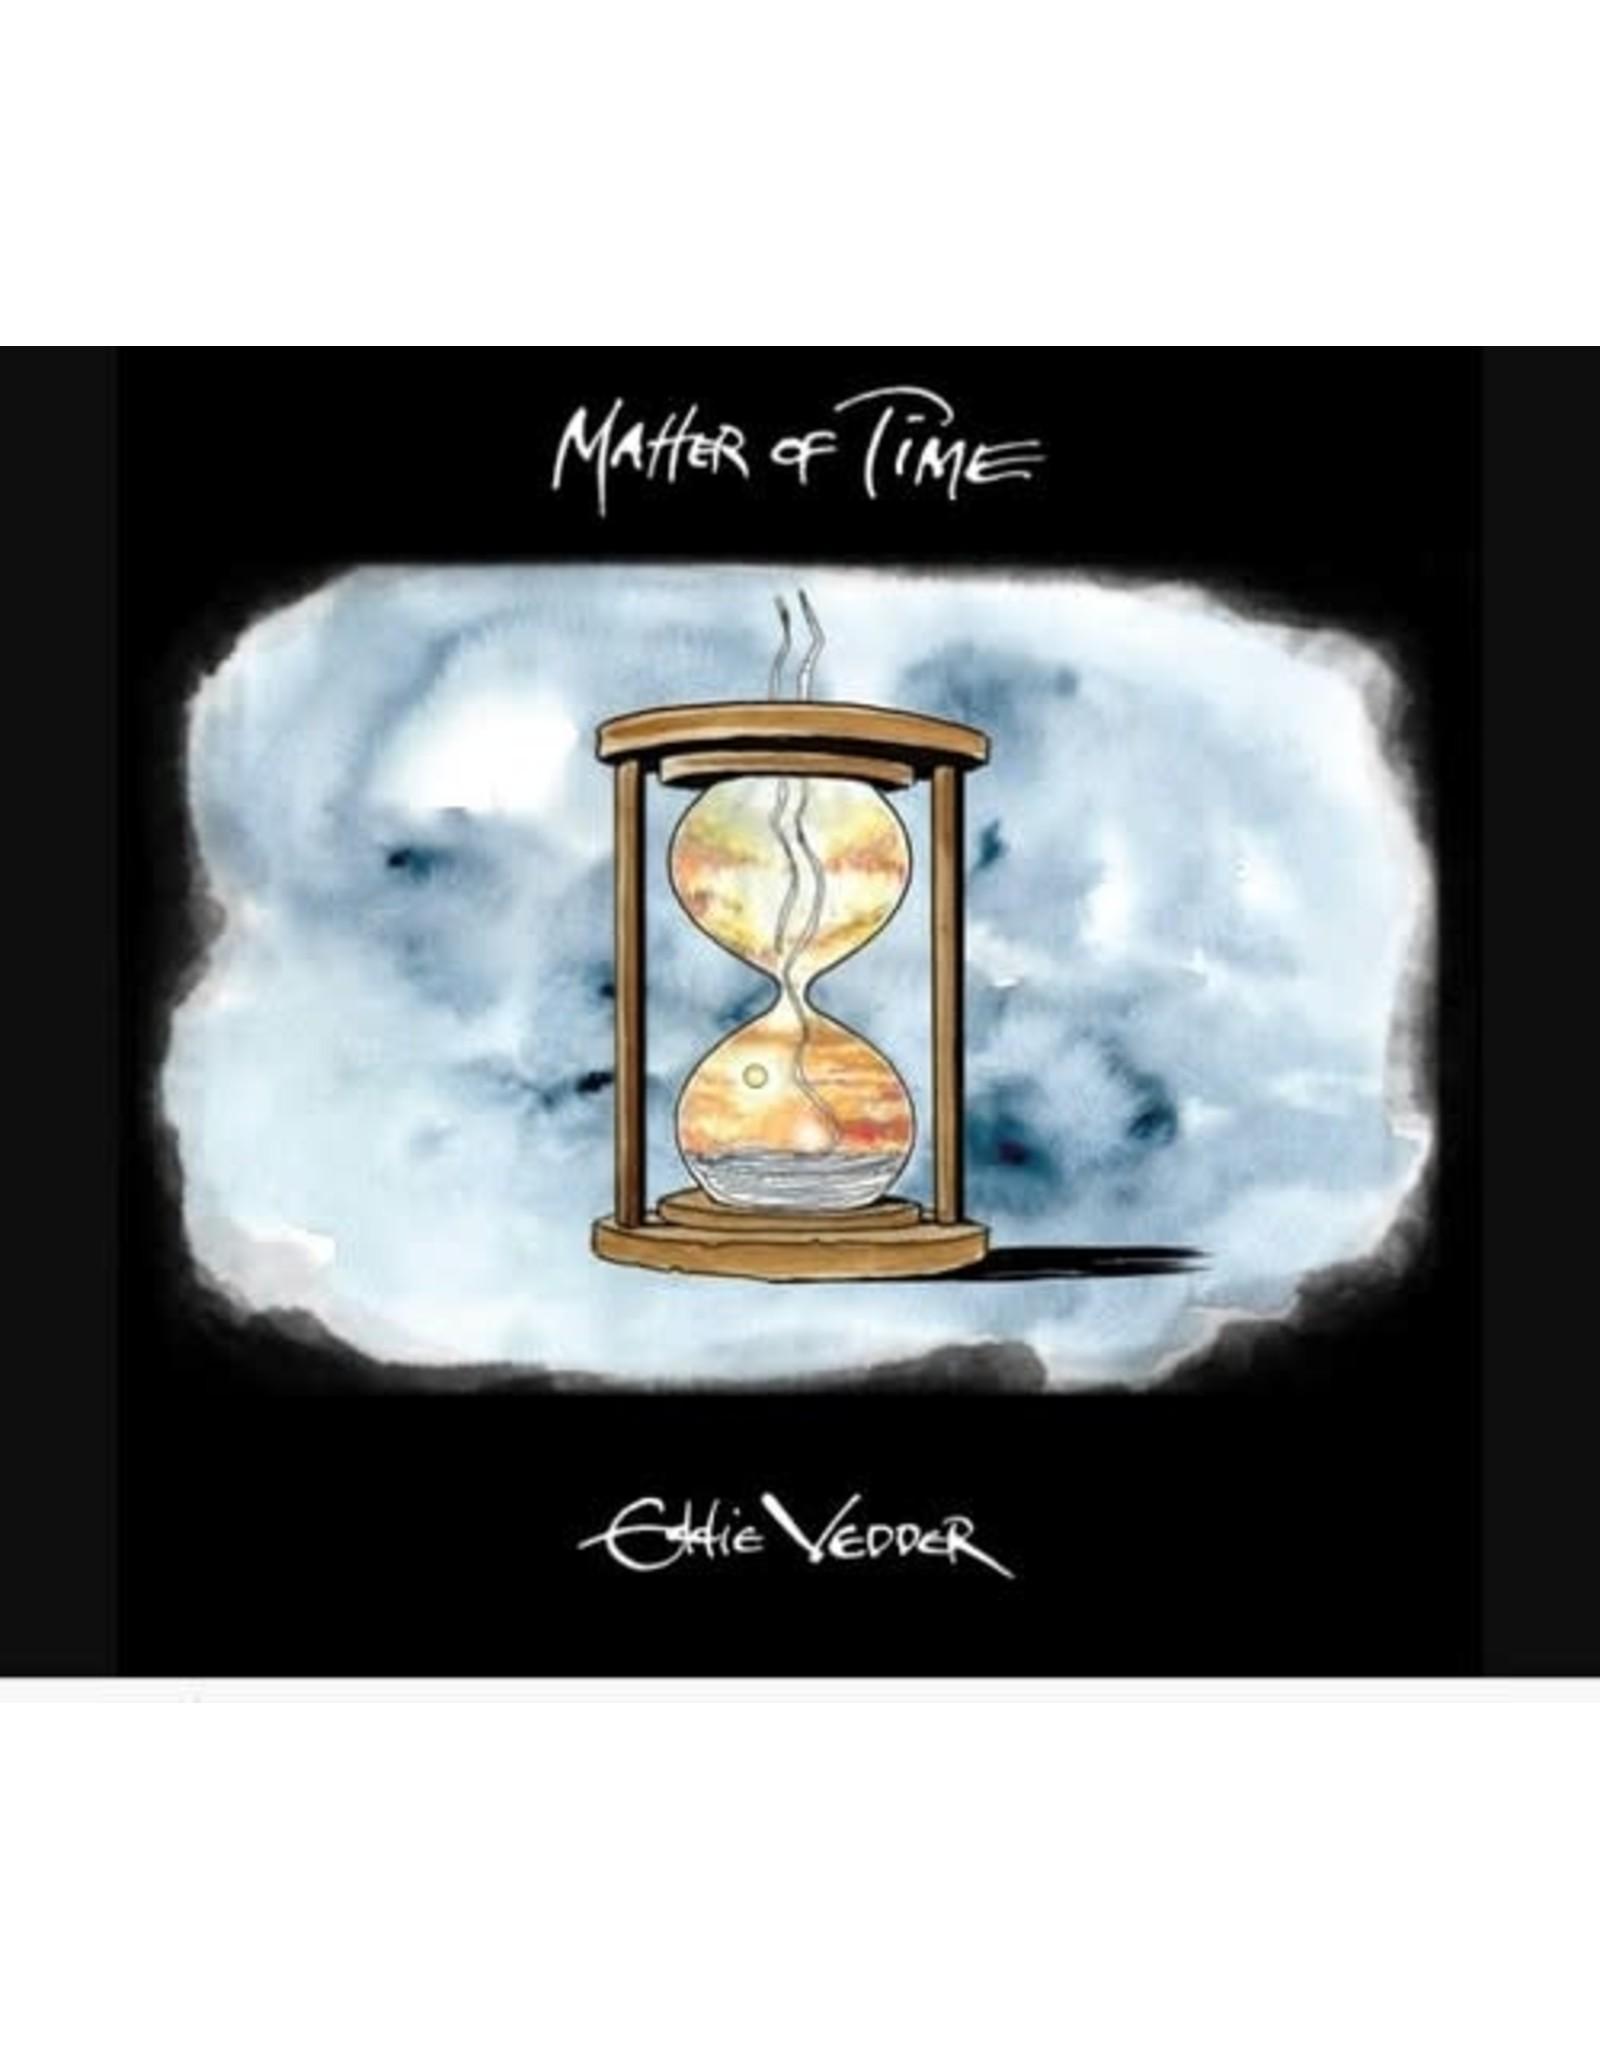 "New Vinyl Eddie Vedder - Matter Of Time / Say Hi 7"""